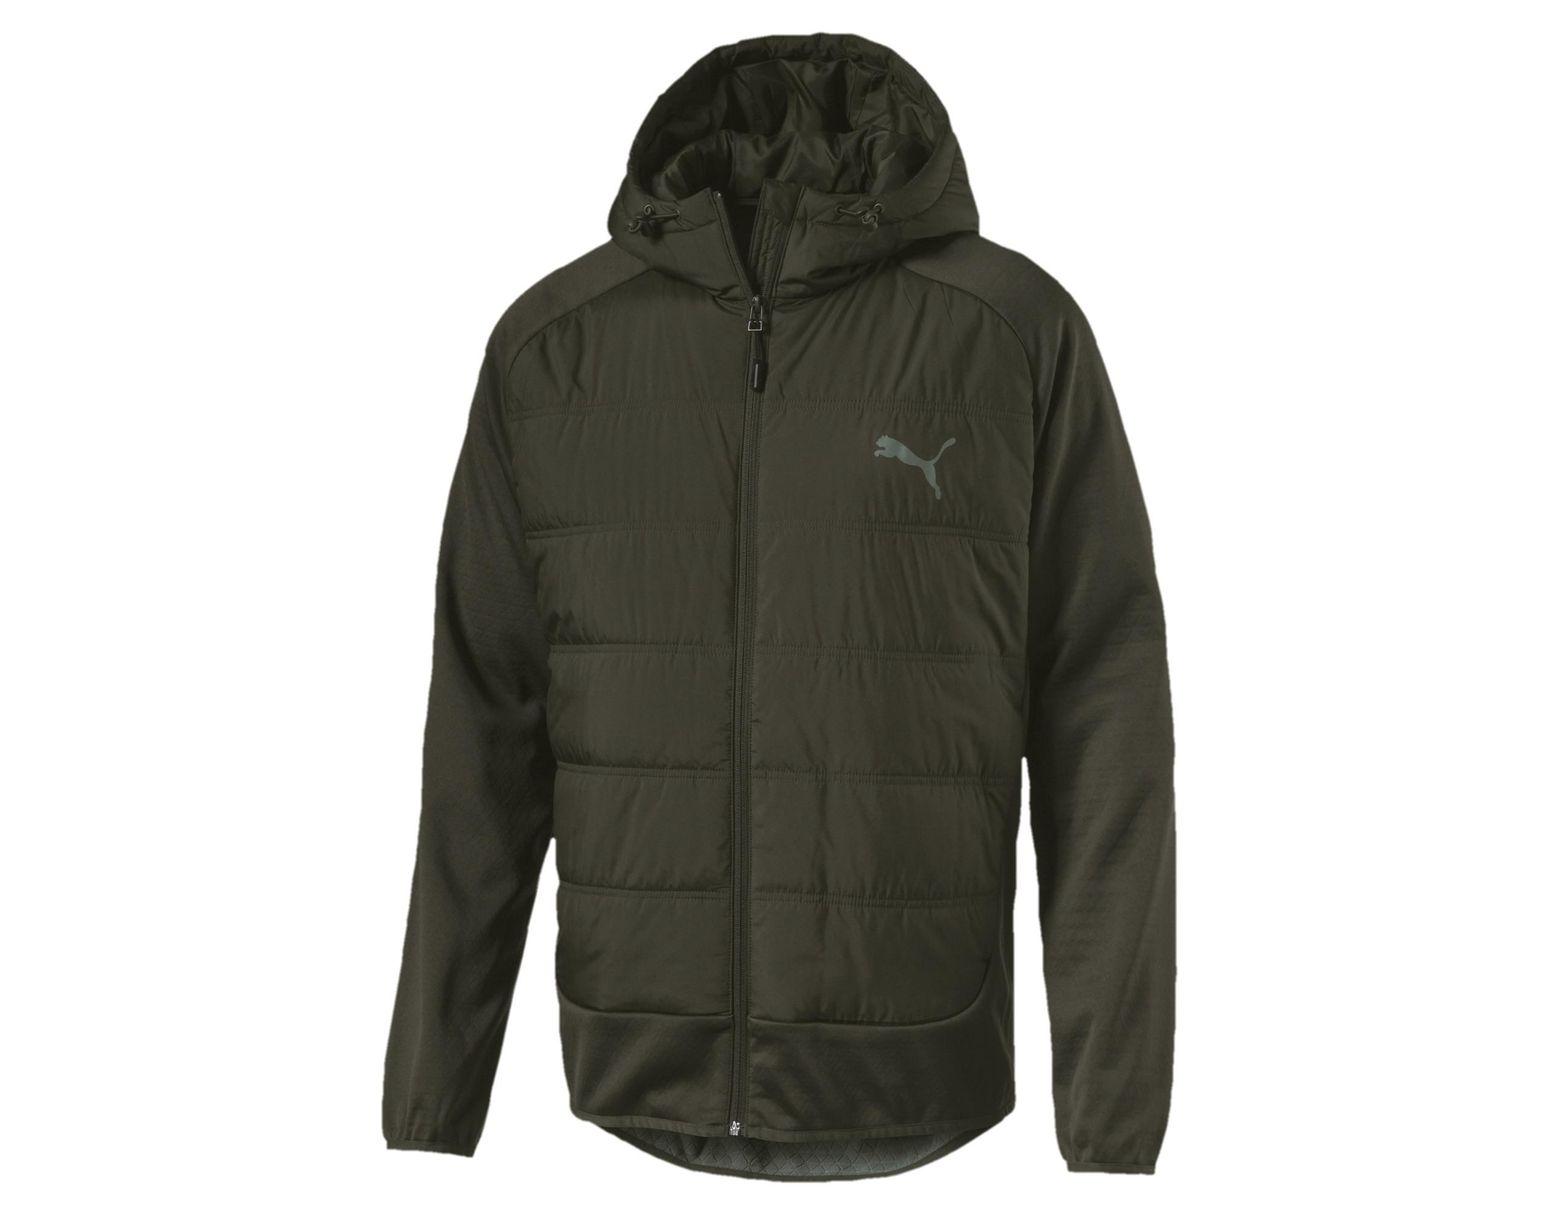 0b5890314 Green Hybrid Men's Padded Jacket